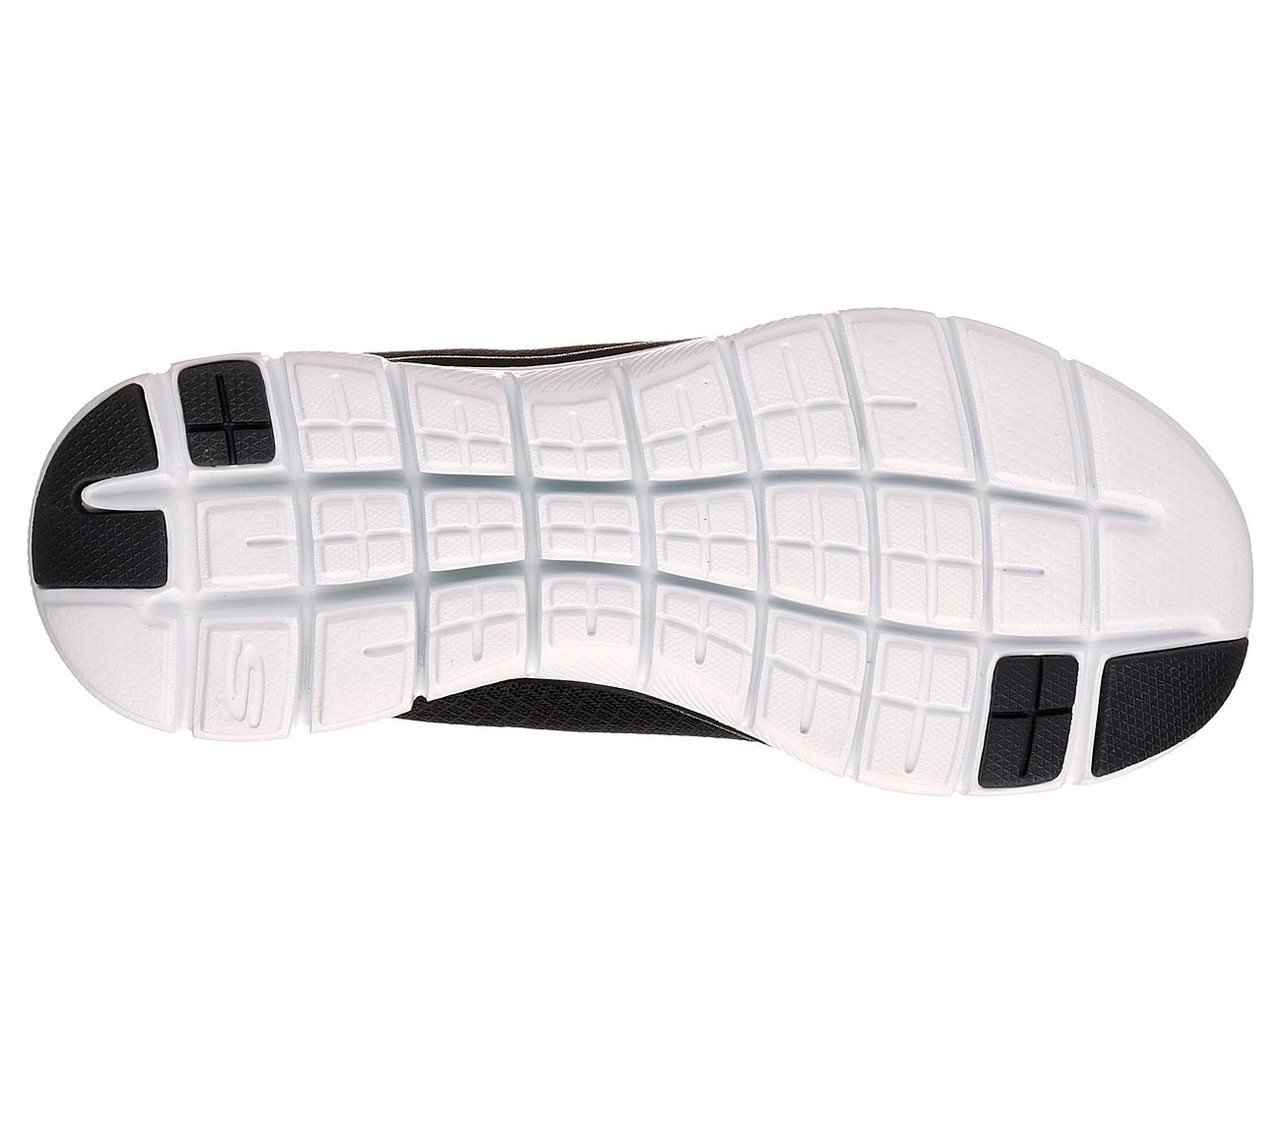 866dd57d3a2e Skechers Ladies Flex Appeal 2.0 Newsmaker Black   White - Golders ...